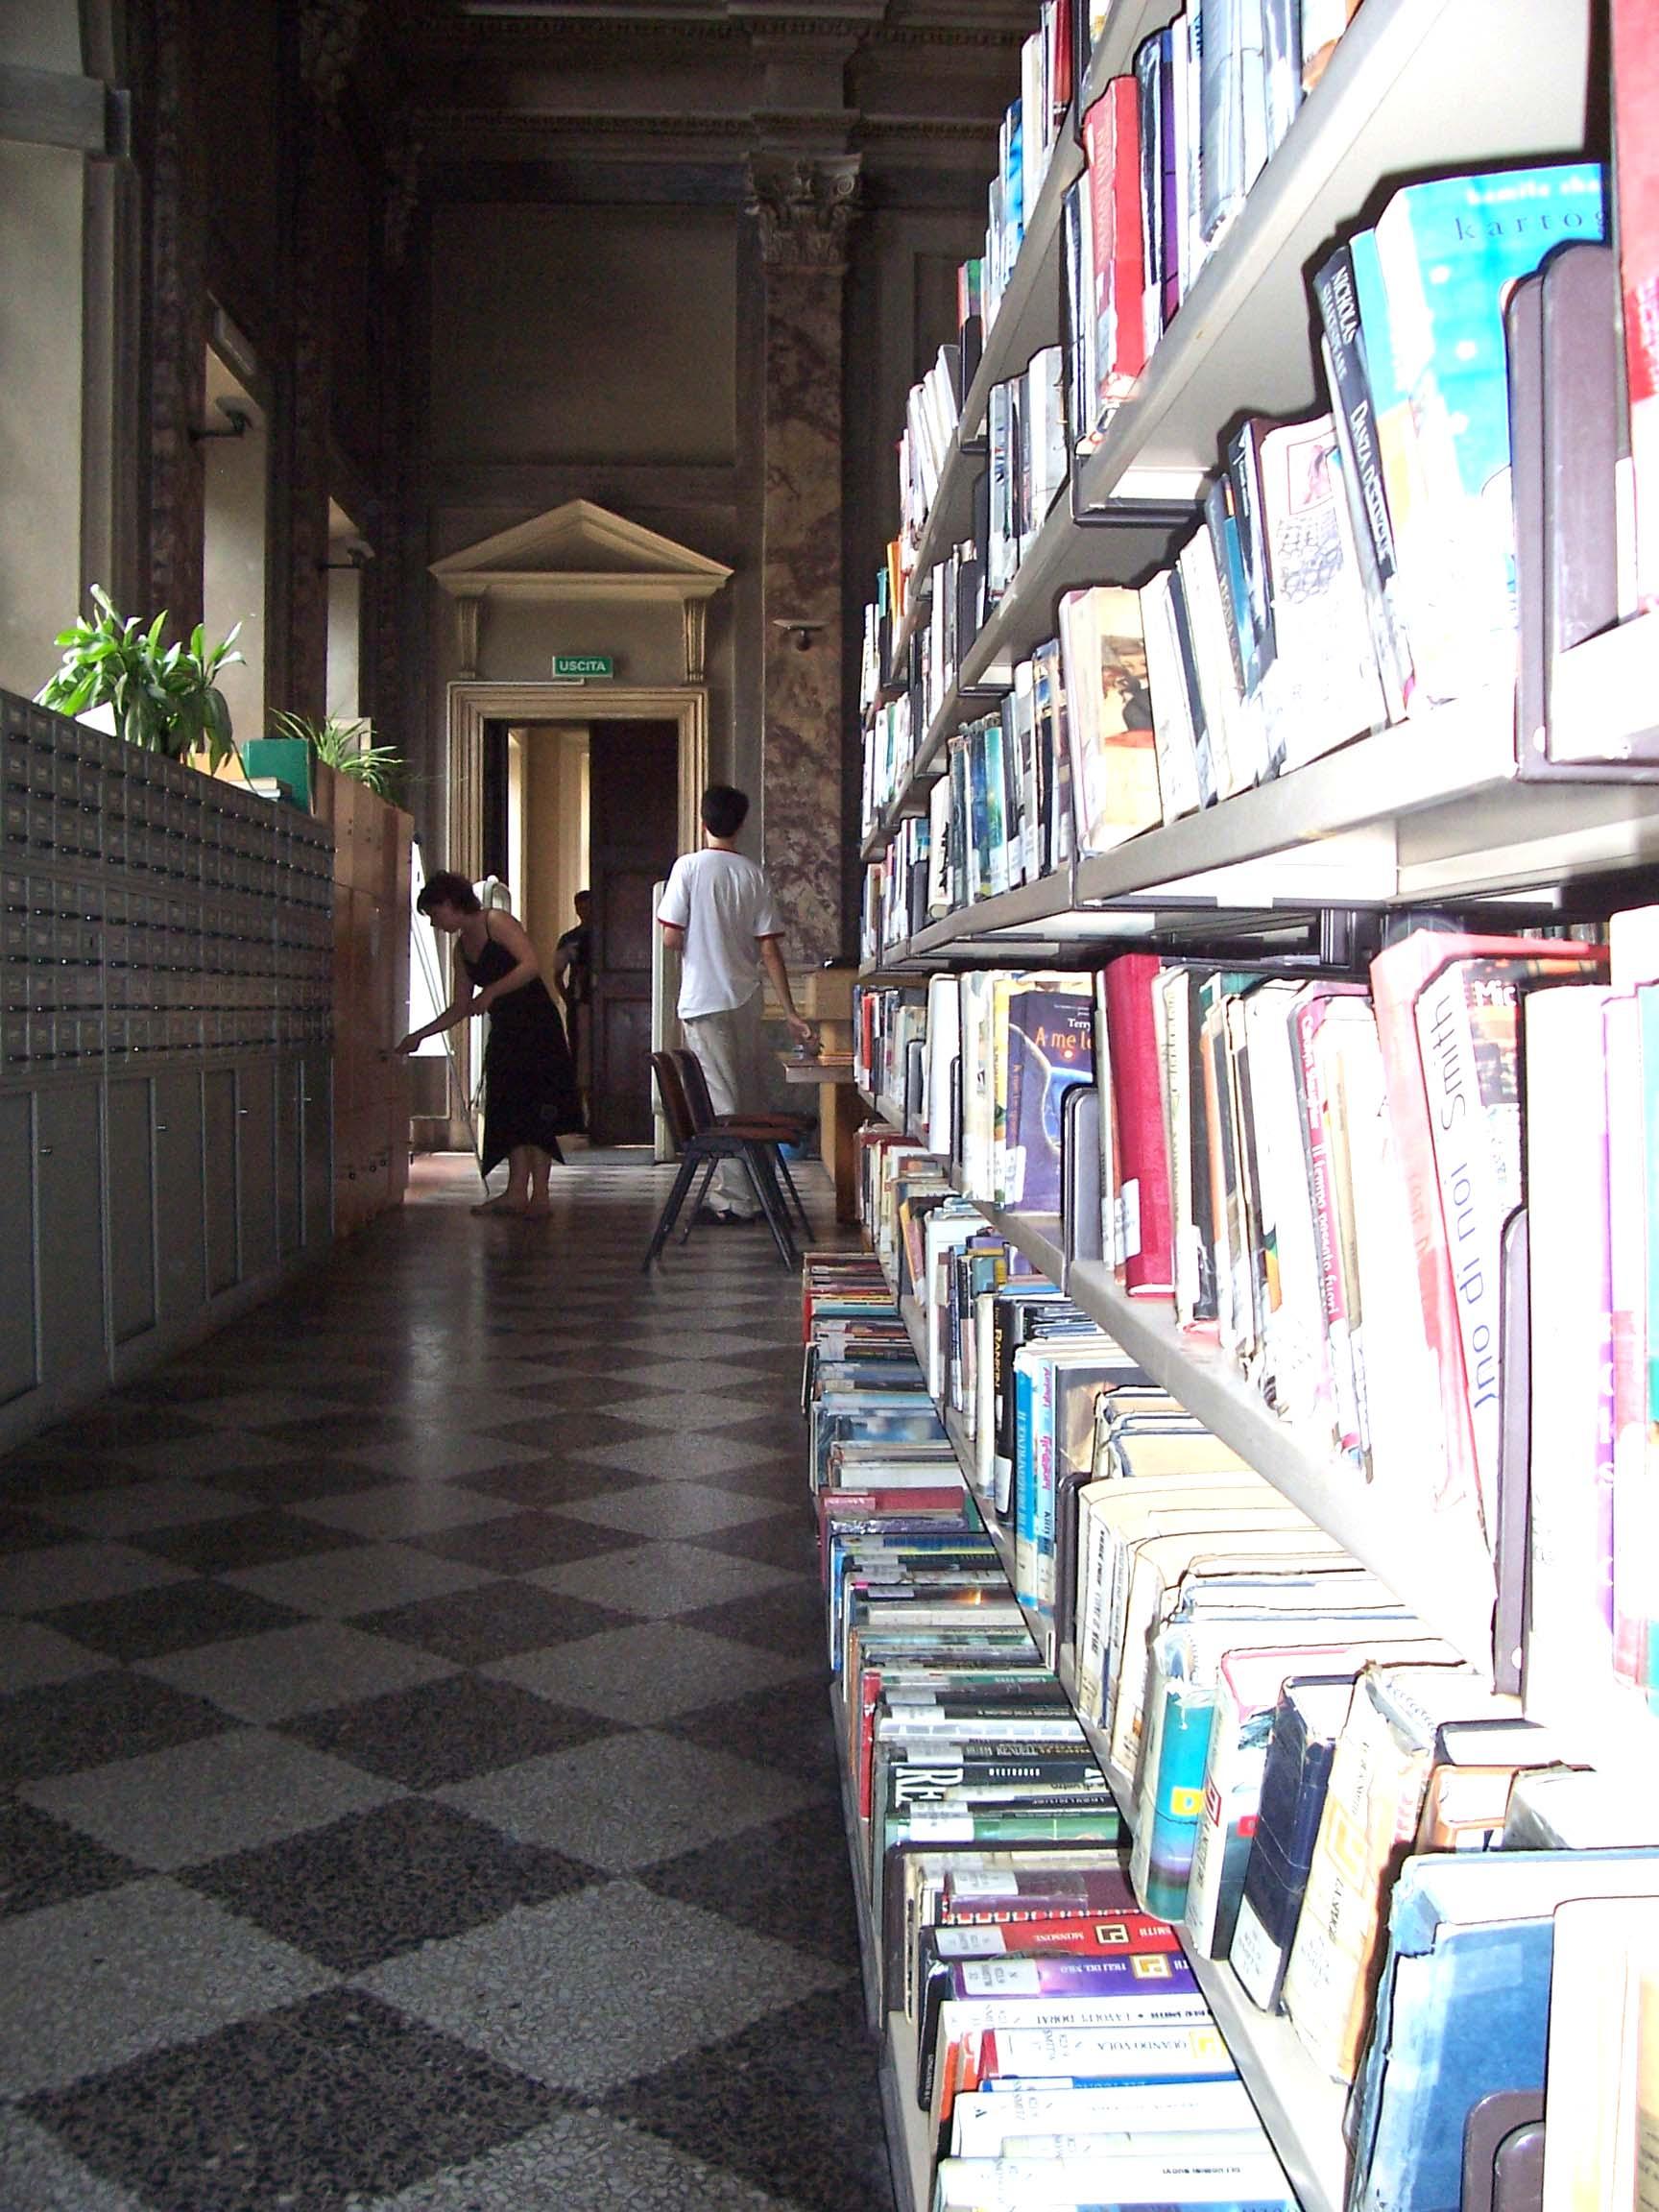 bibliotec civica Canna